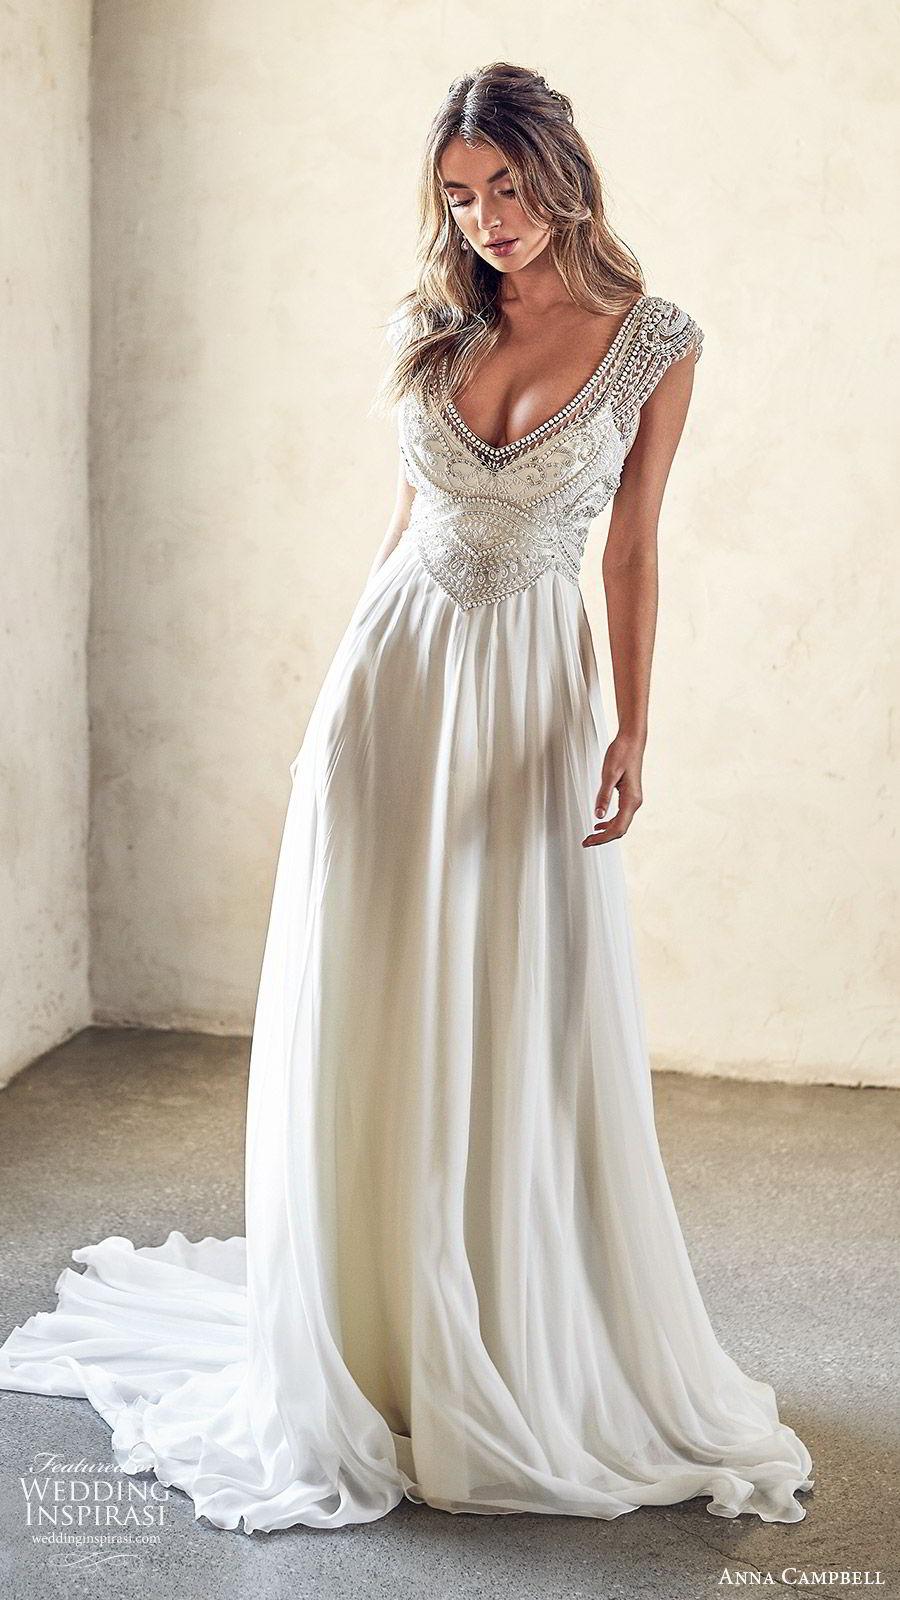 anna campbell 2020 bridal cap sleeves  deep v neckline heavily embellished bodice clean skirt a line wedding dress (12) elegant glam square back chapel train mv